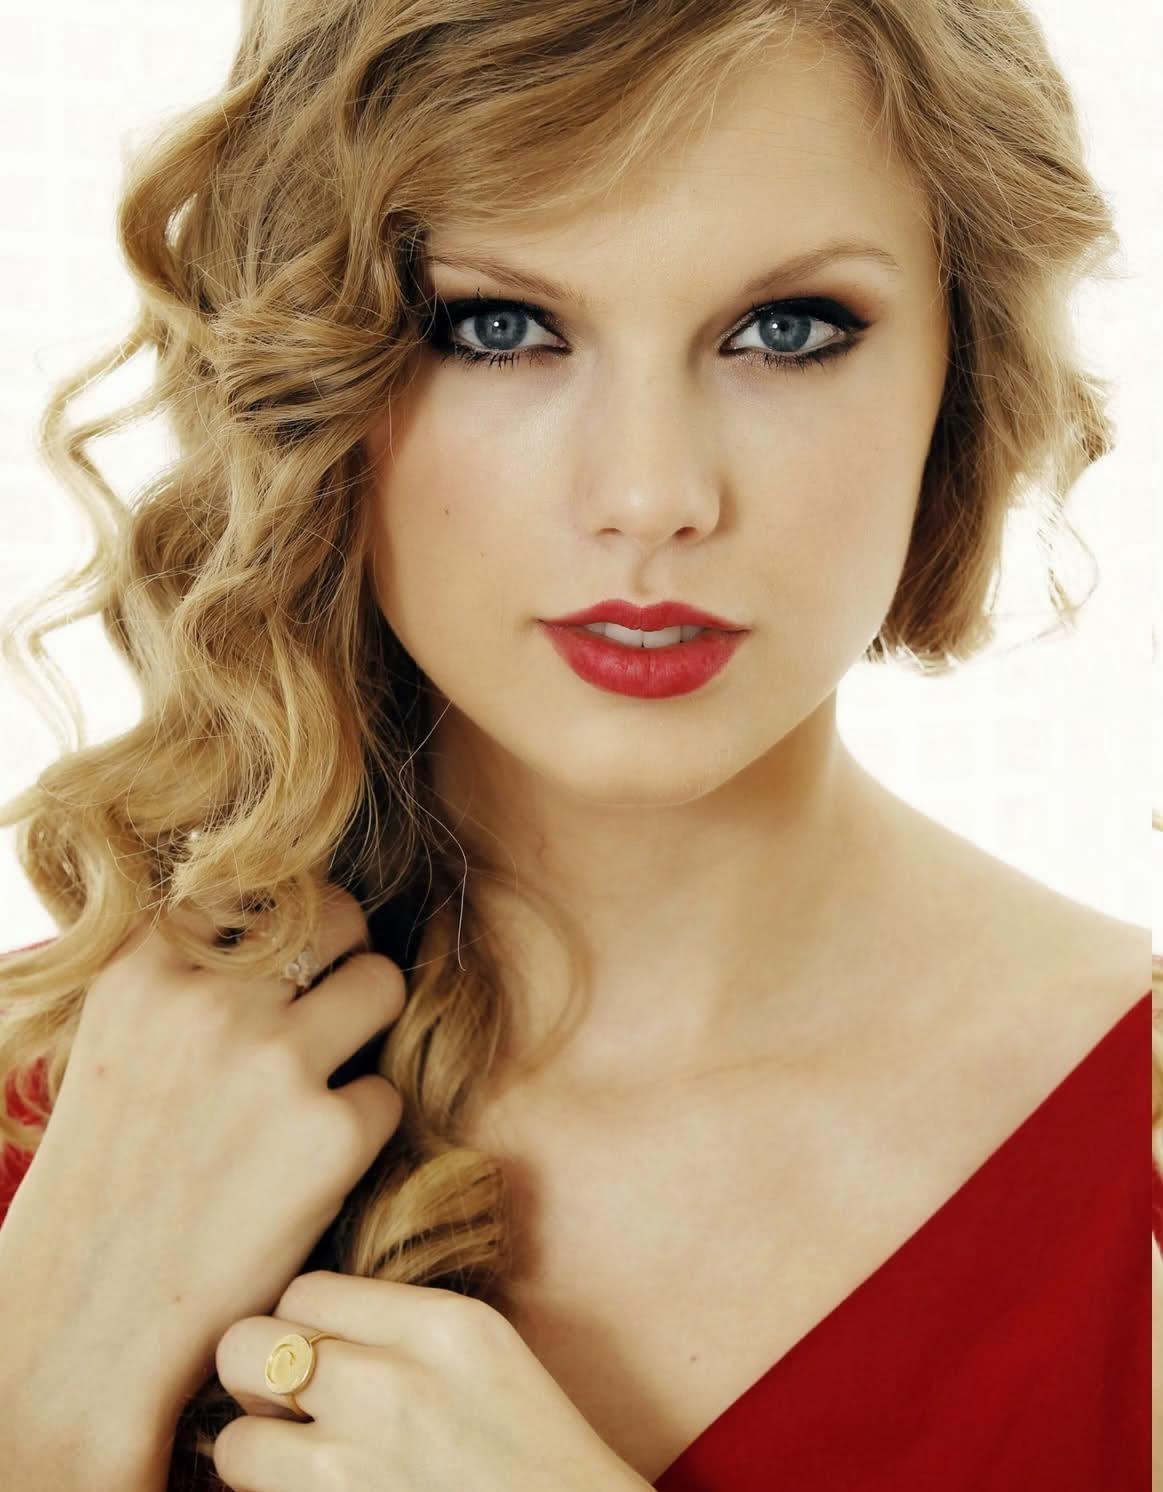 taylor-swift-hot-taylor-swift-18776371-1163-1492.jpg Taylor Swift